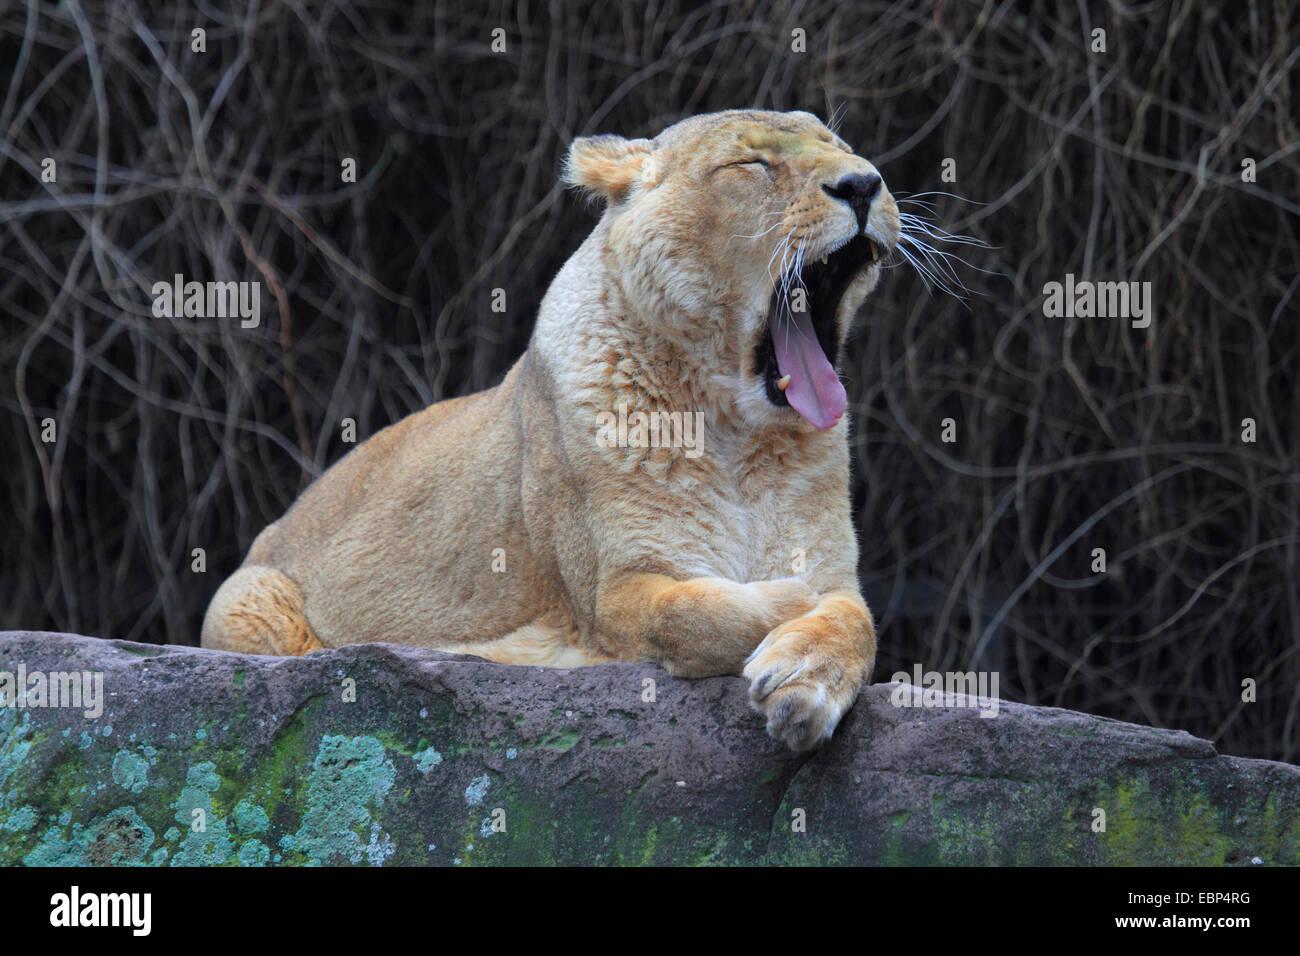 Asiatic lion (Panthera leo persica), yawning - Stock Image